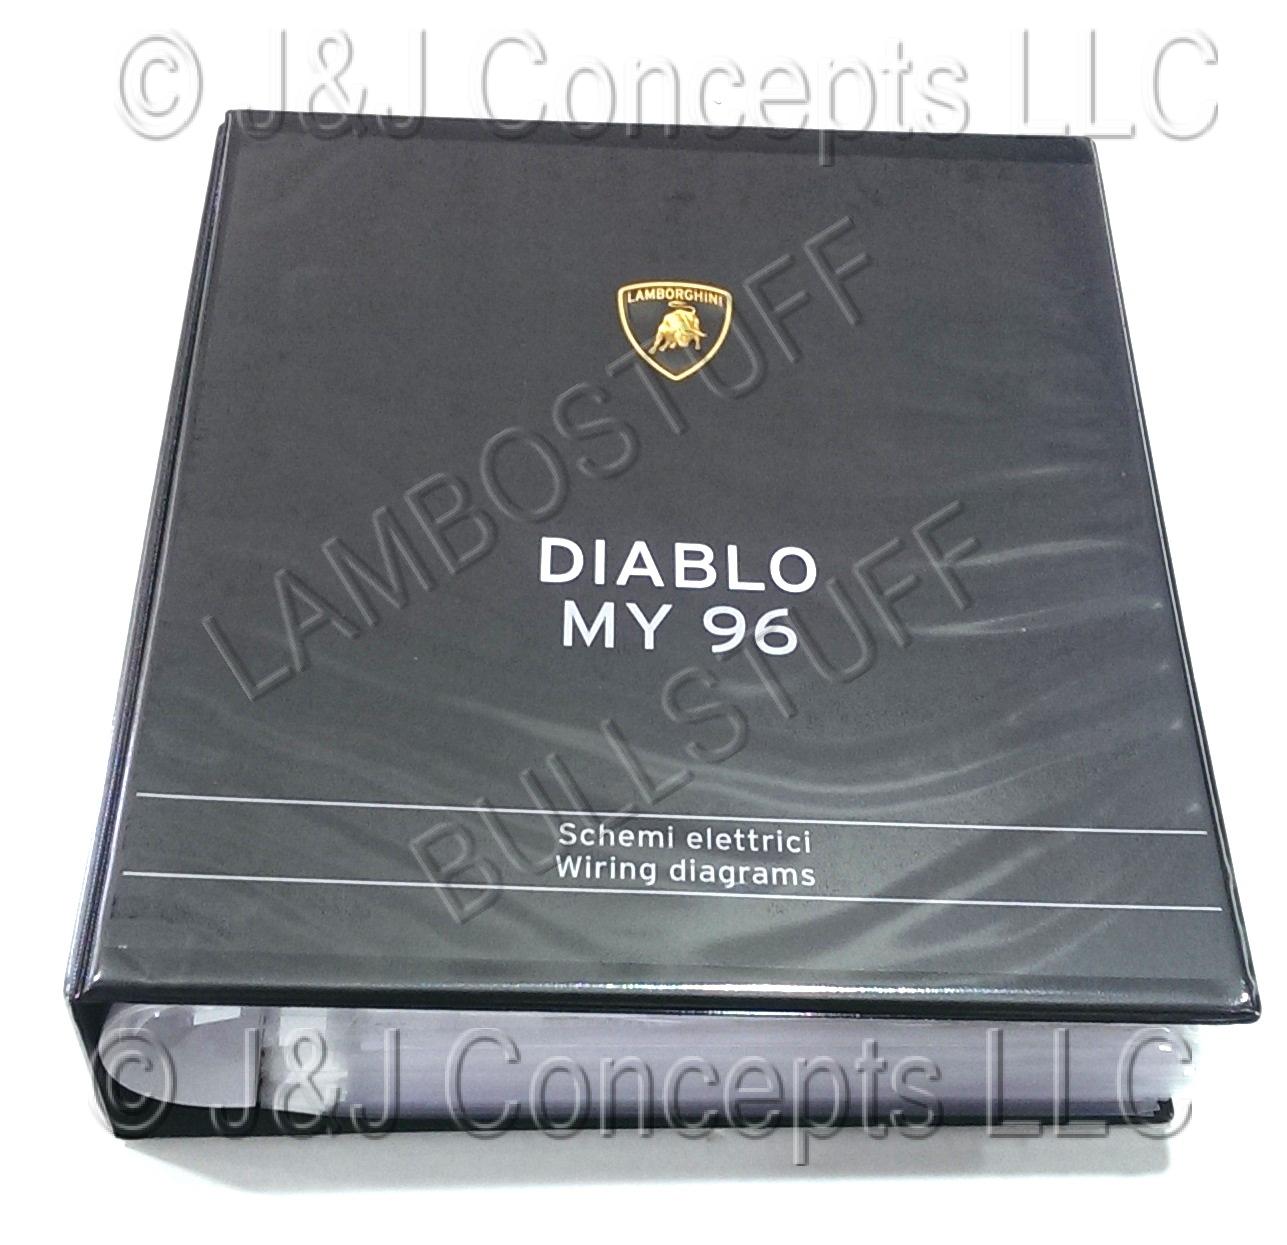 Lamborghini Wiring Manuals Original Factory Reg Books Diablo 1996 Manual